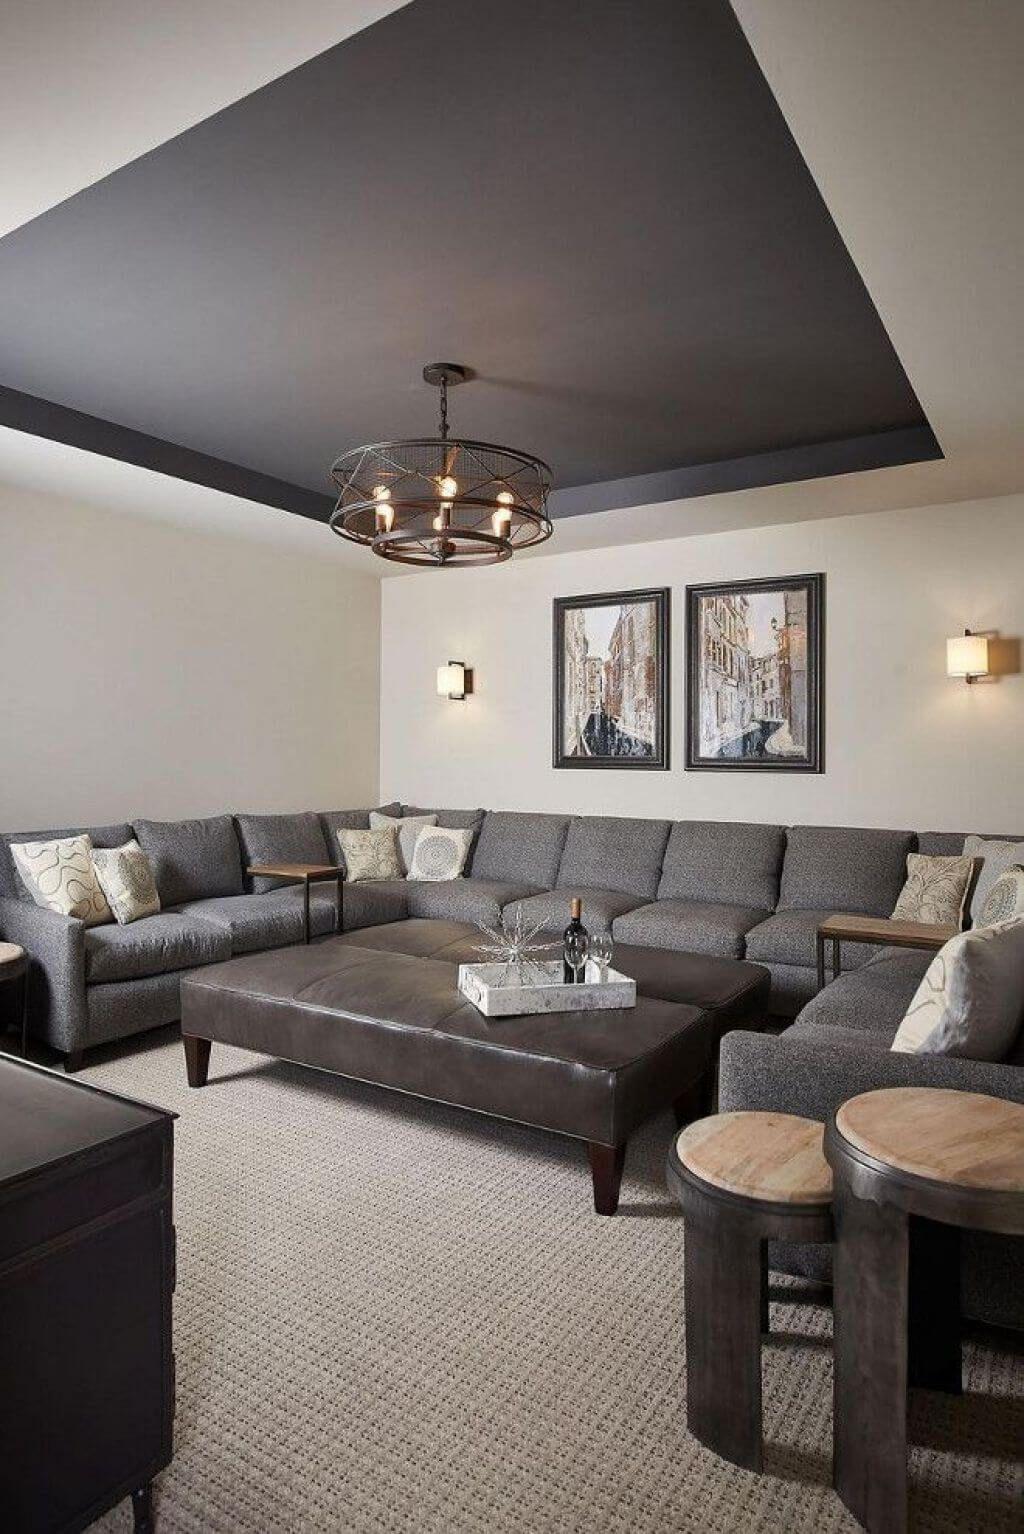 Home holl innenarchitektur cheap basement ceiling ideas   modern gypsum ceiling for